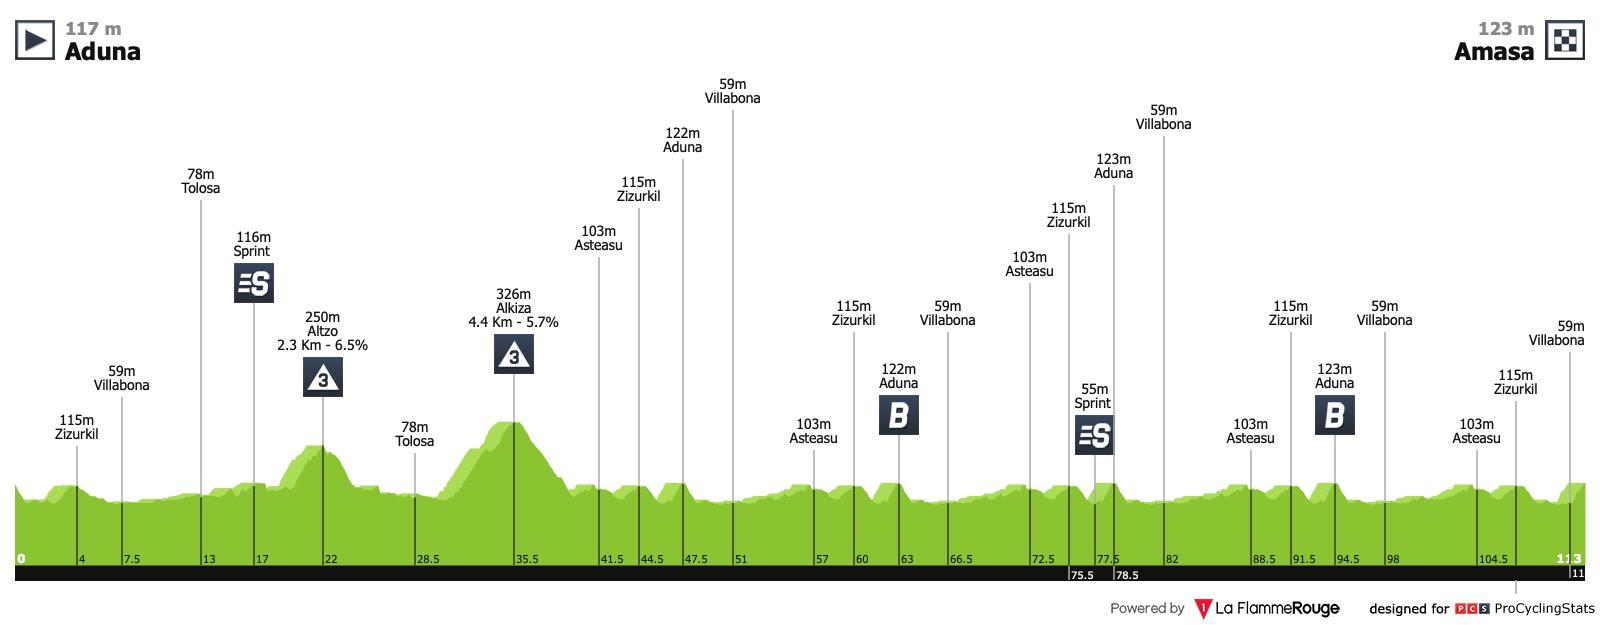 Le topic du cyclisme féminin - Page 47 Iurreta-emakumeen-bira-2019-stage-2-profile-5520c66a88